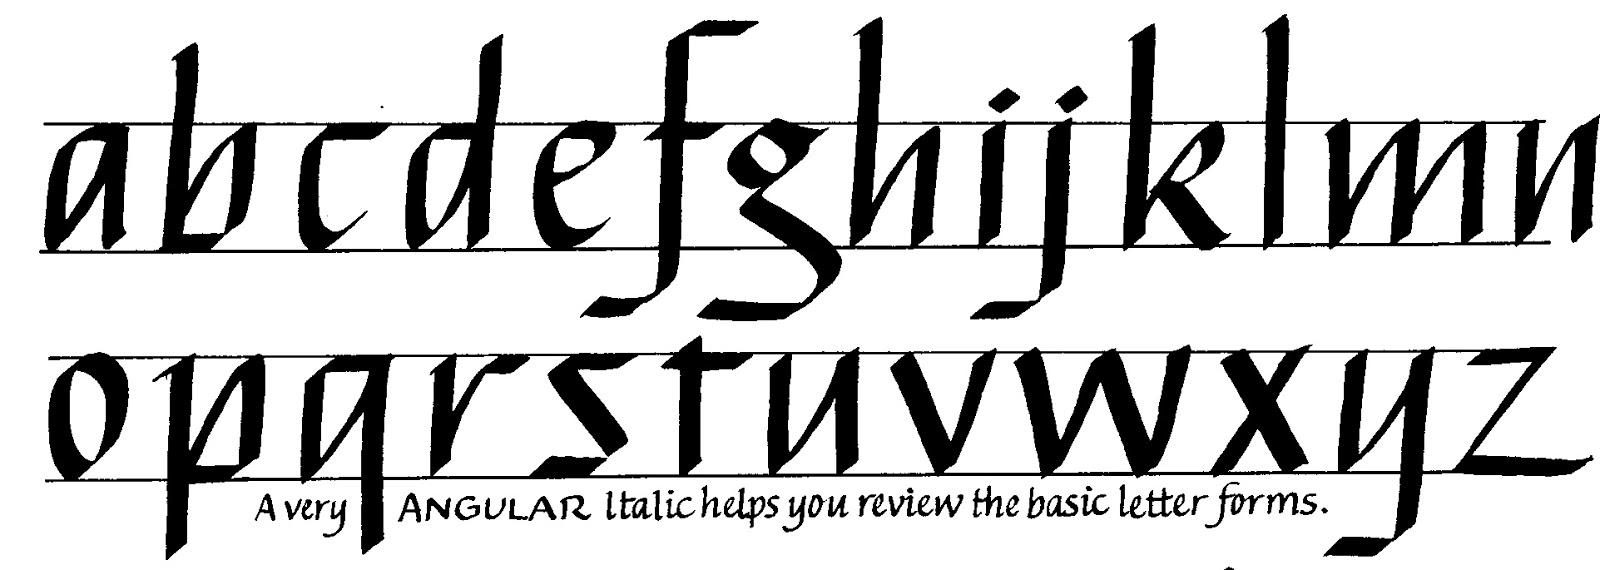 Margaret Shepherd: Calligraphy Blog: 162 Angular Italic